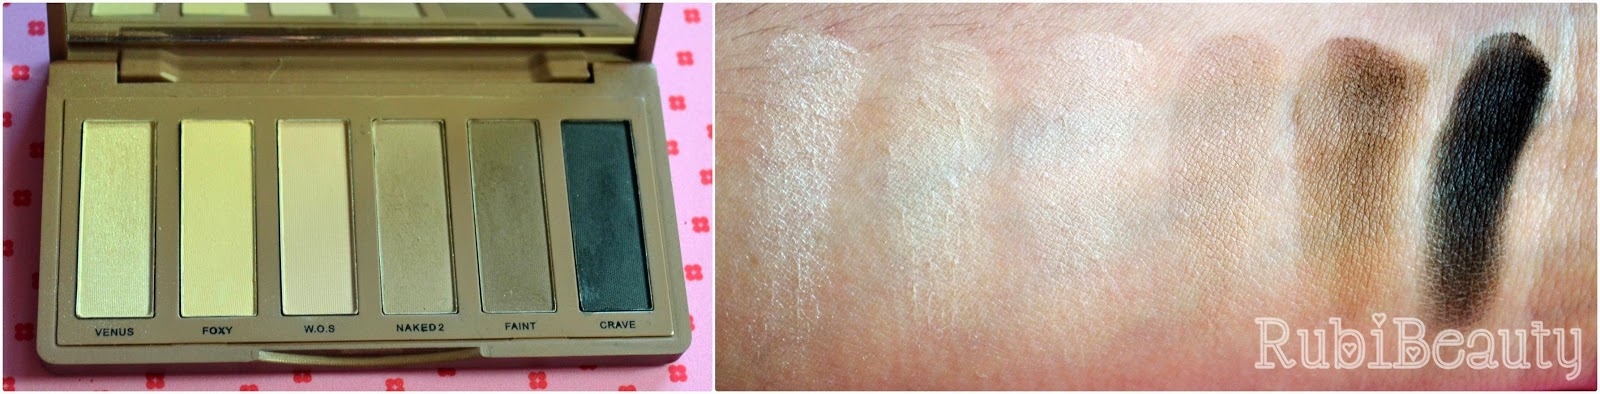 rubibeauty review paleta naked basics urban decay clon buyincoins swatches chuaches